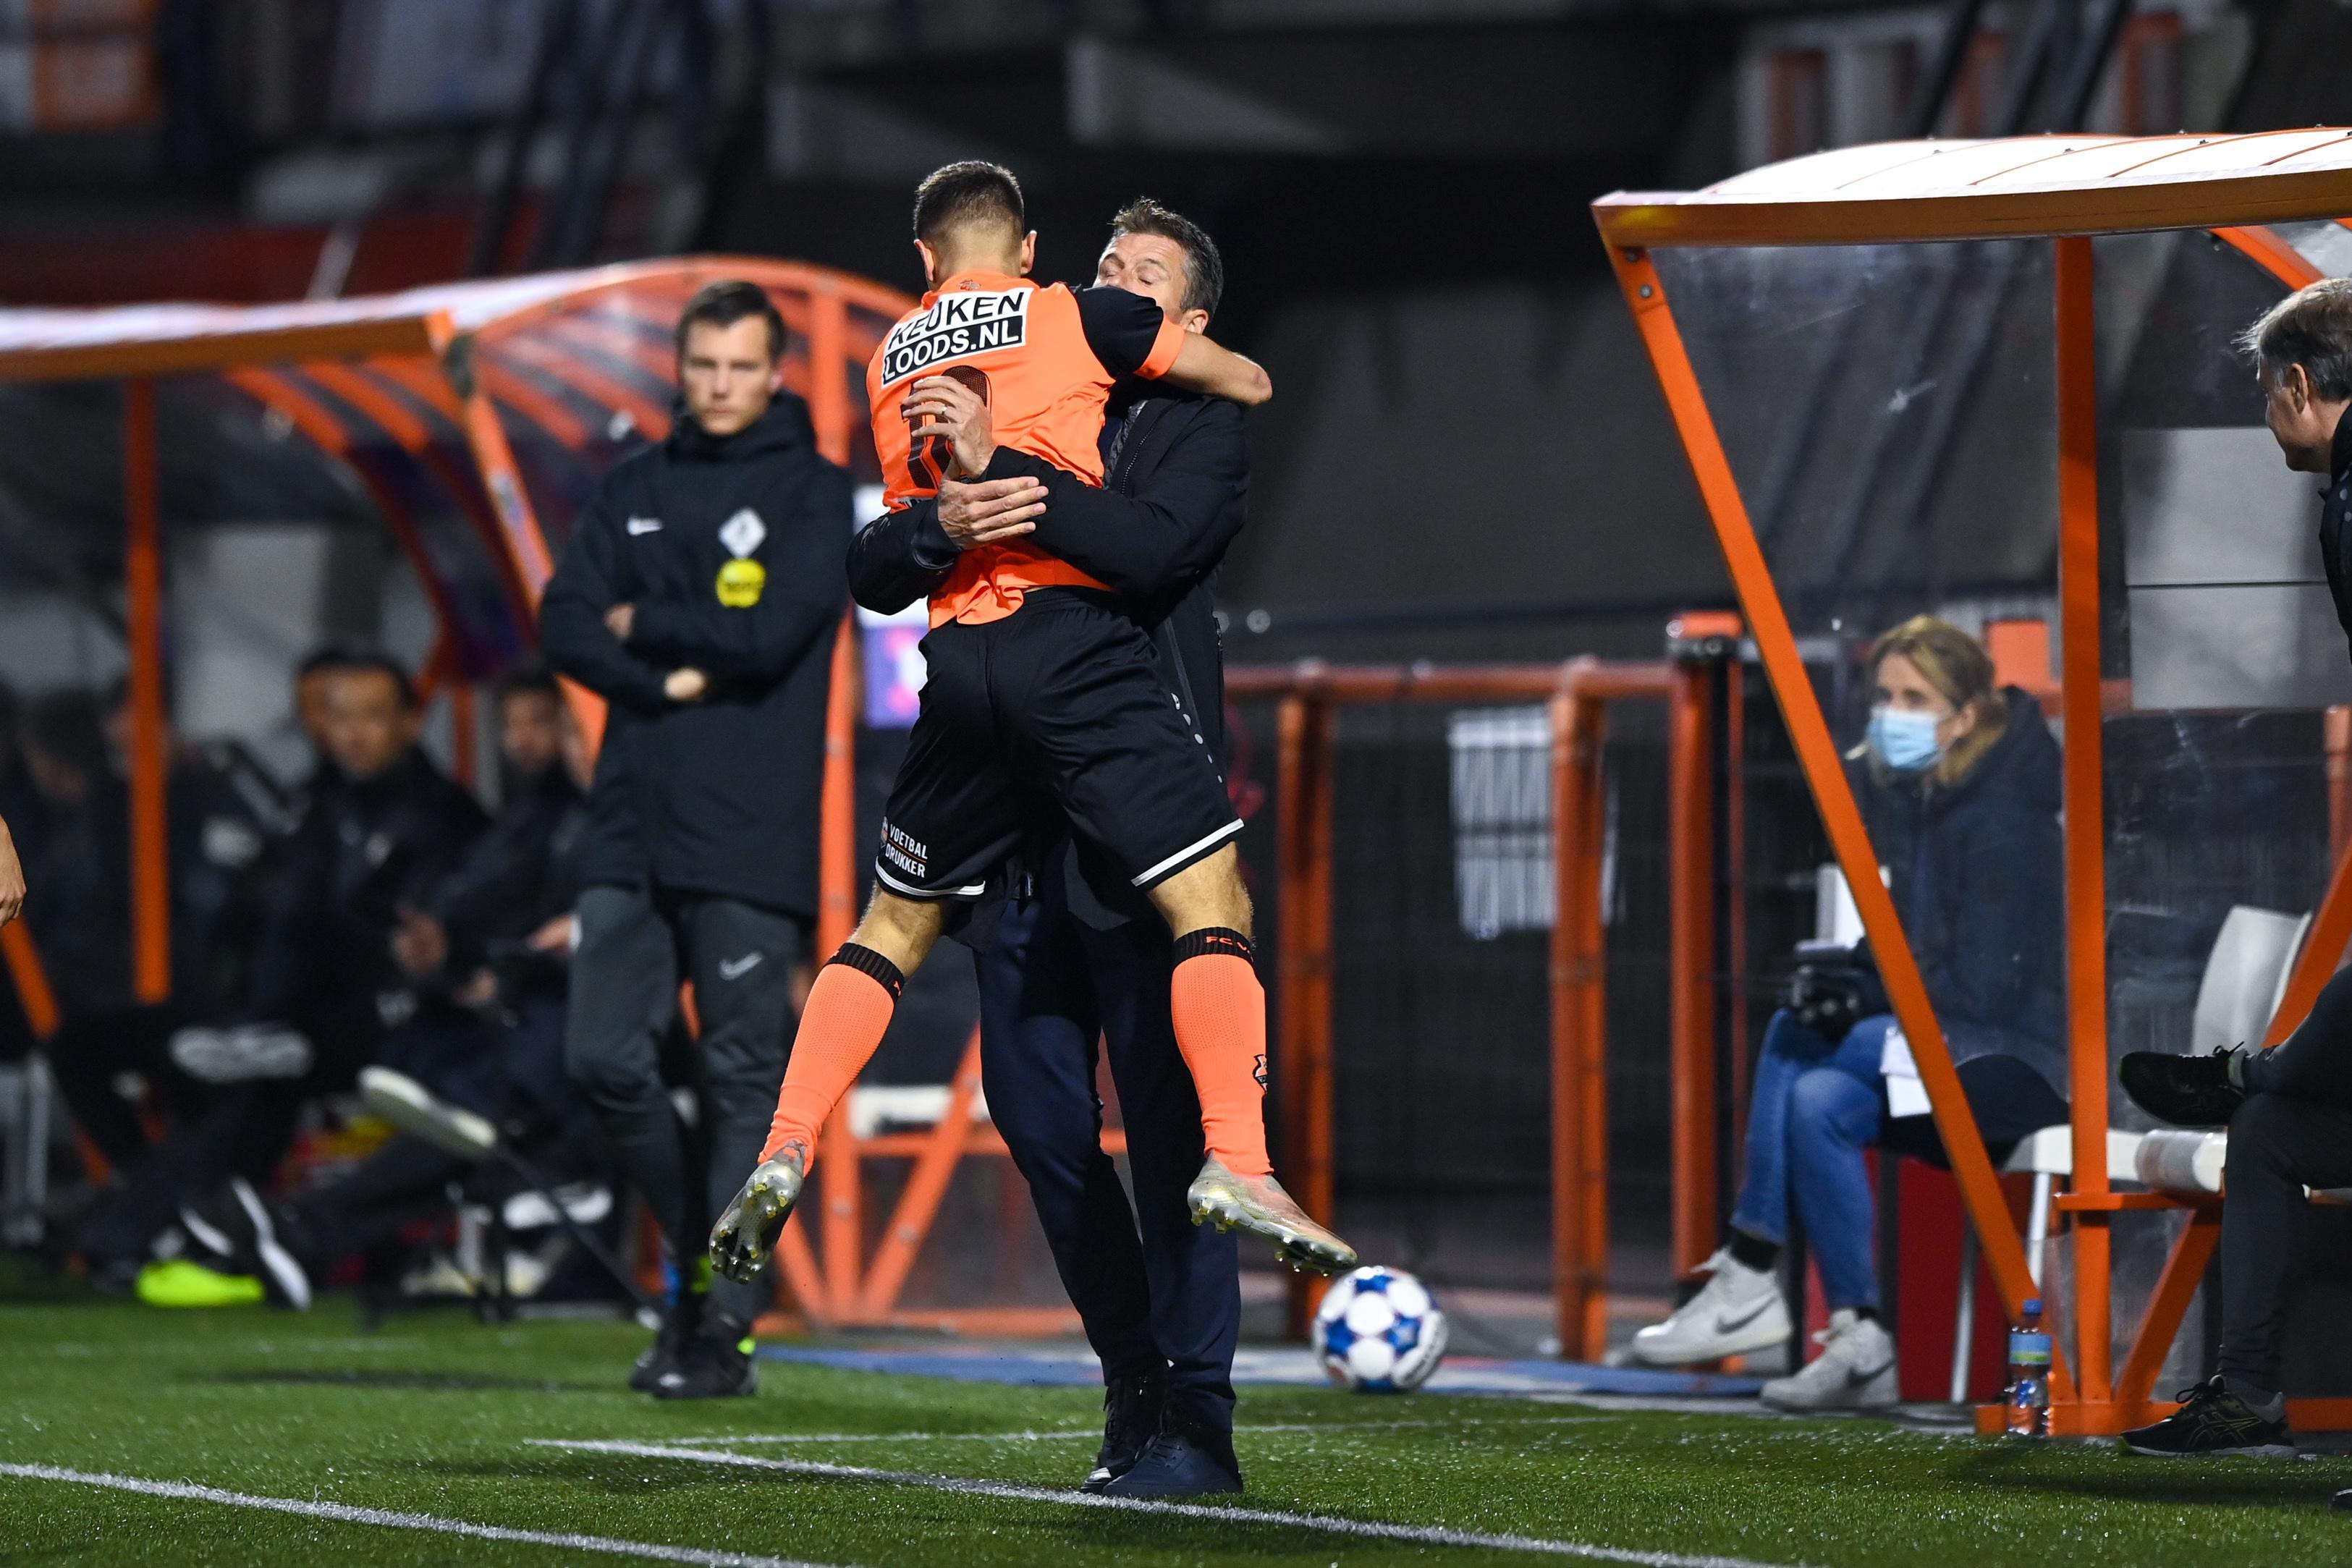 FC Volendam breekt na rust de ban tegen Jong PSV: 5-1